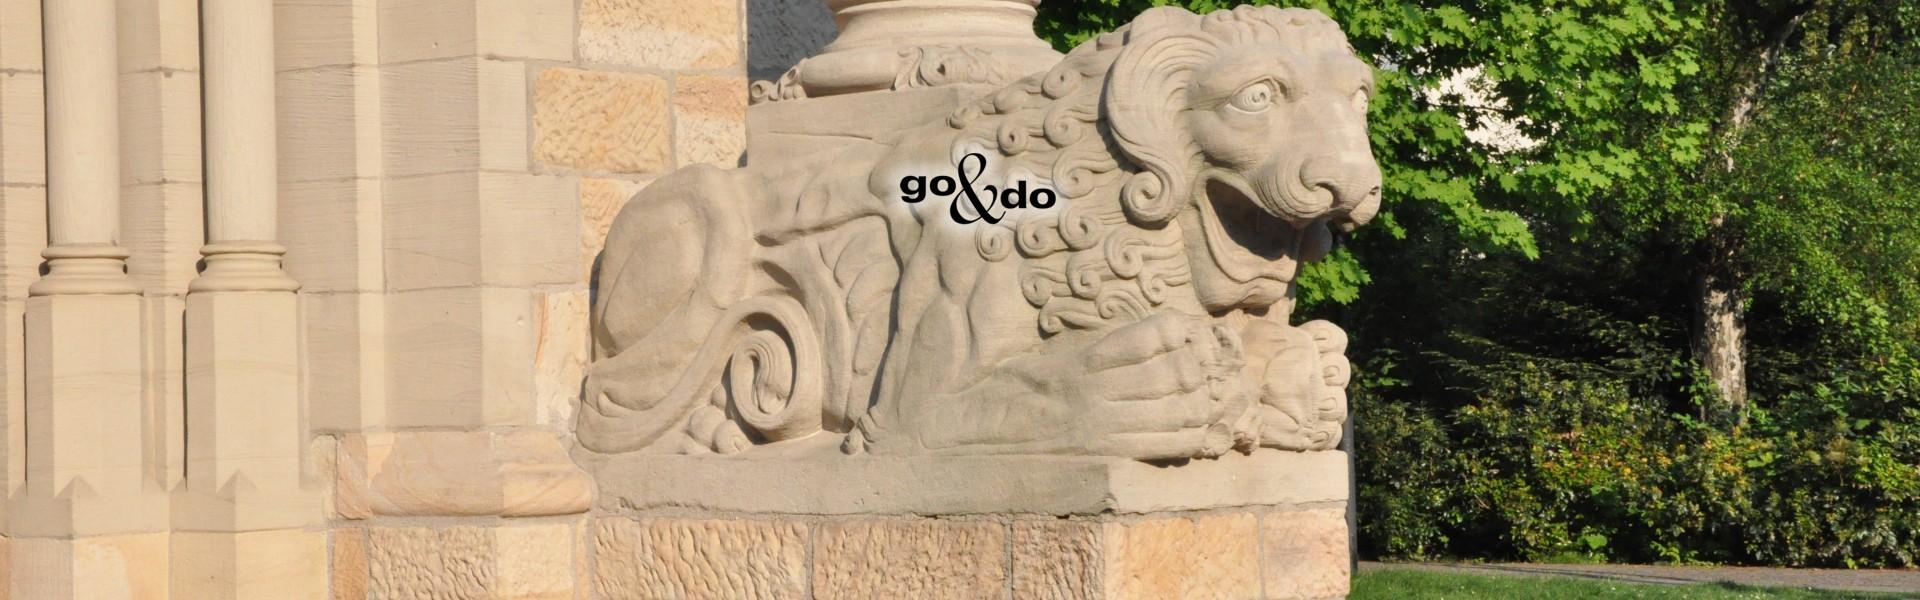 go & do - Carsten A. Godowski